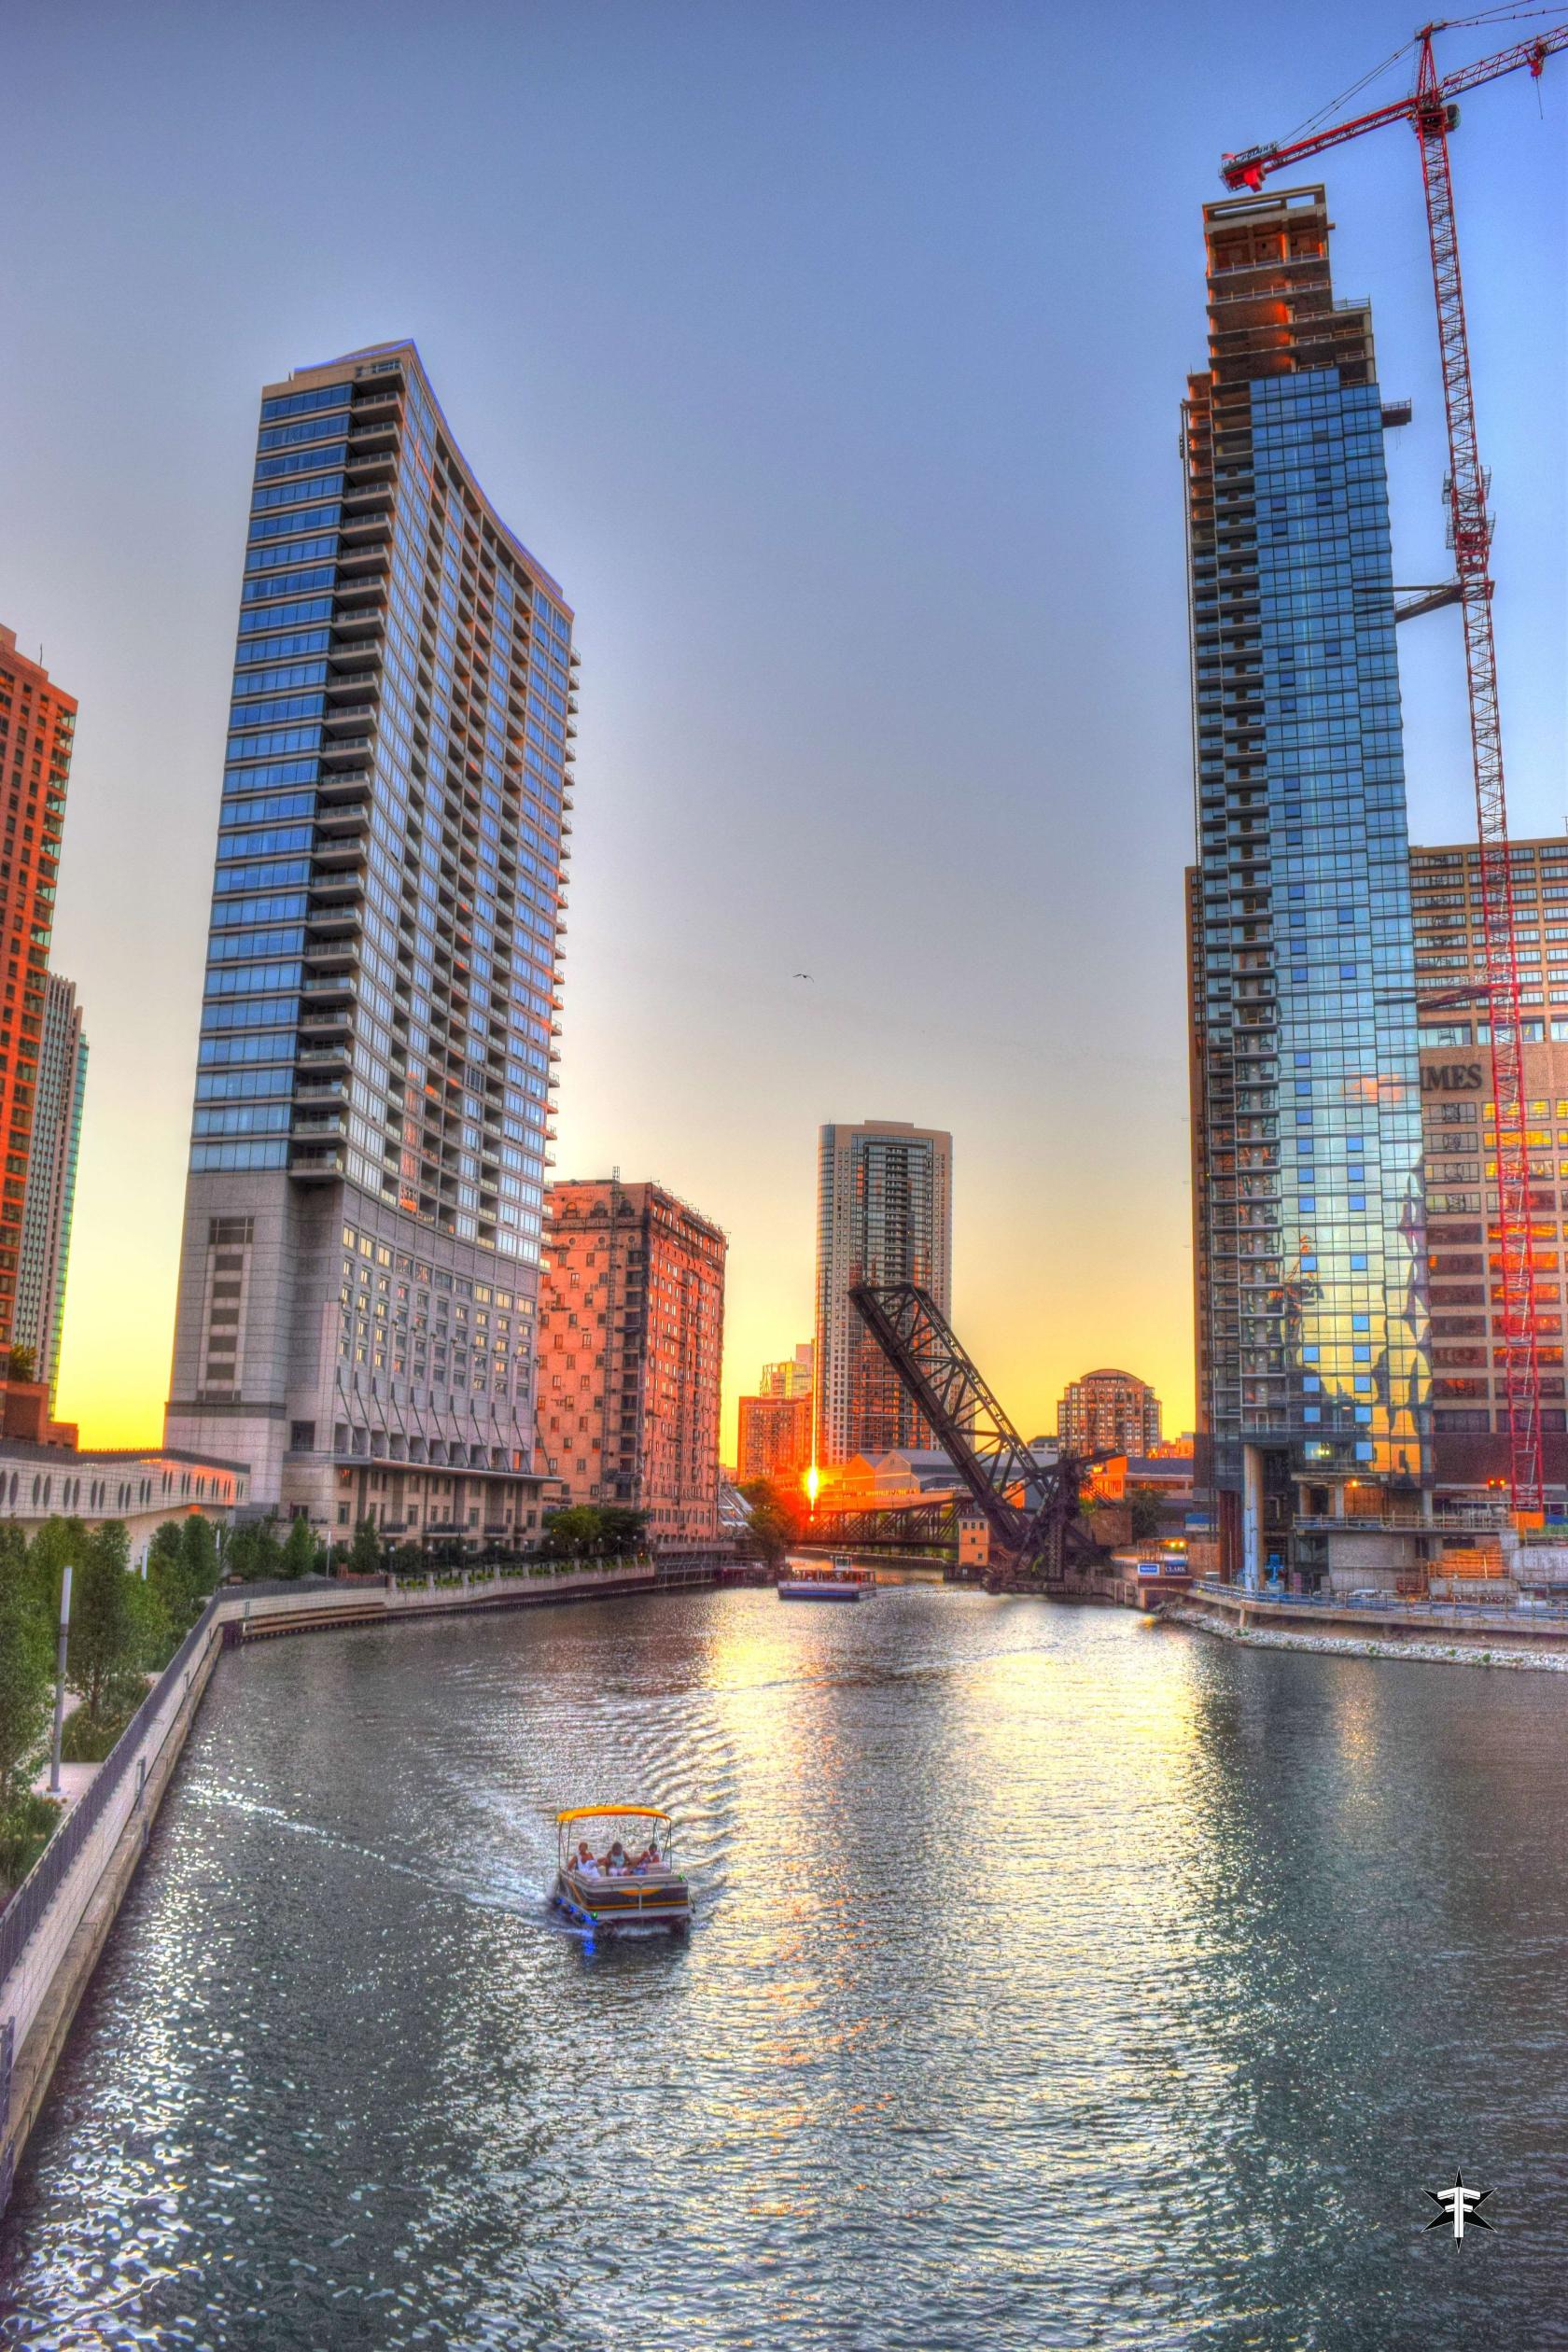 batch_wolf point construction building chicago goldenhour sunset boat.jpg